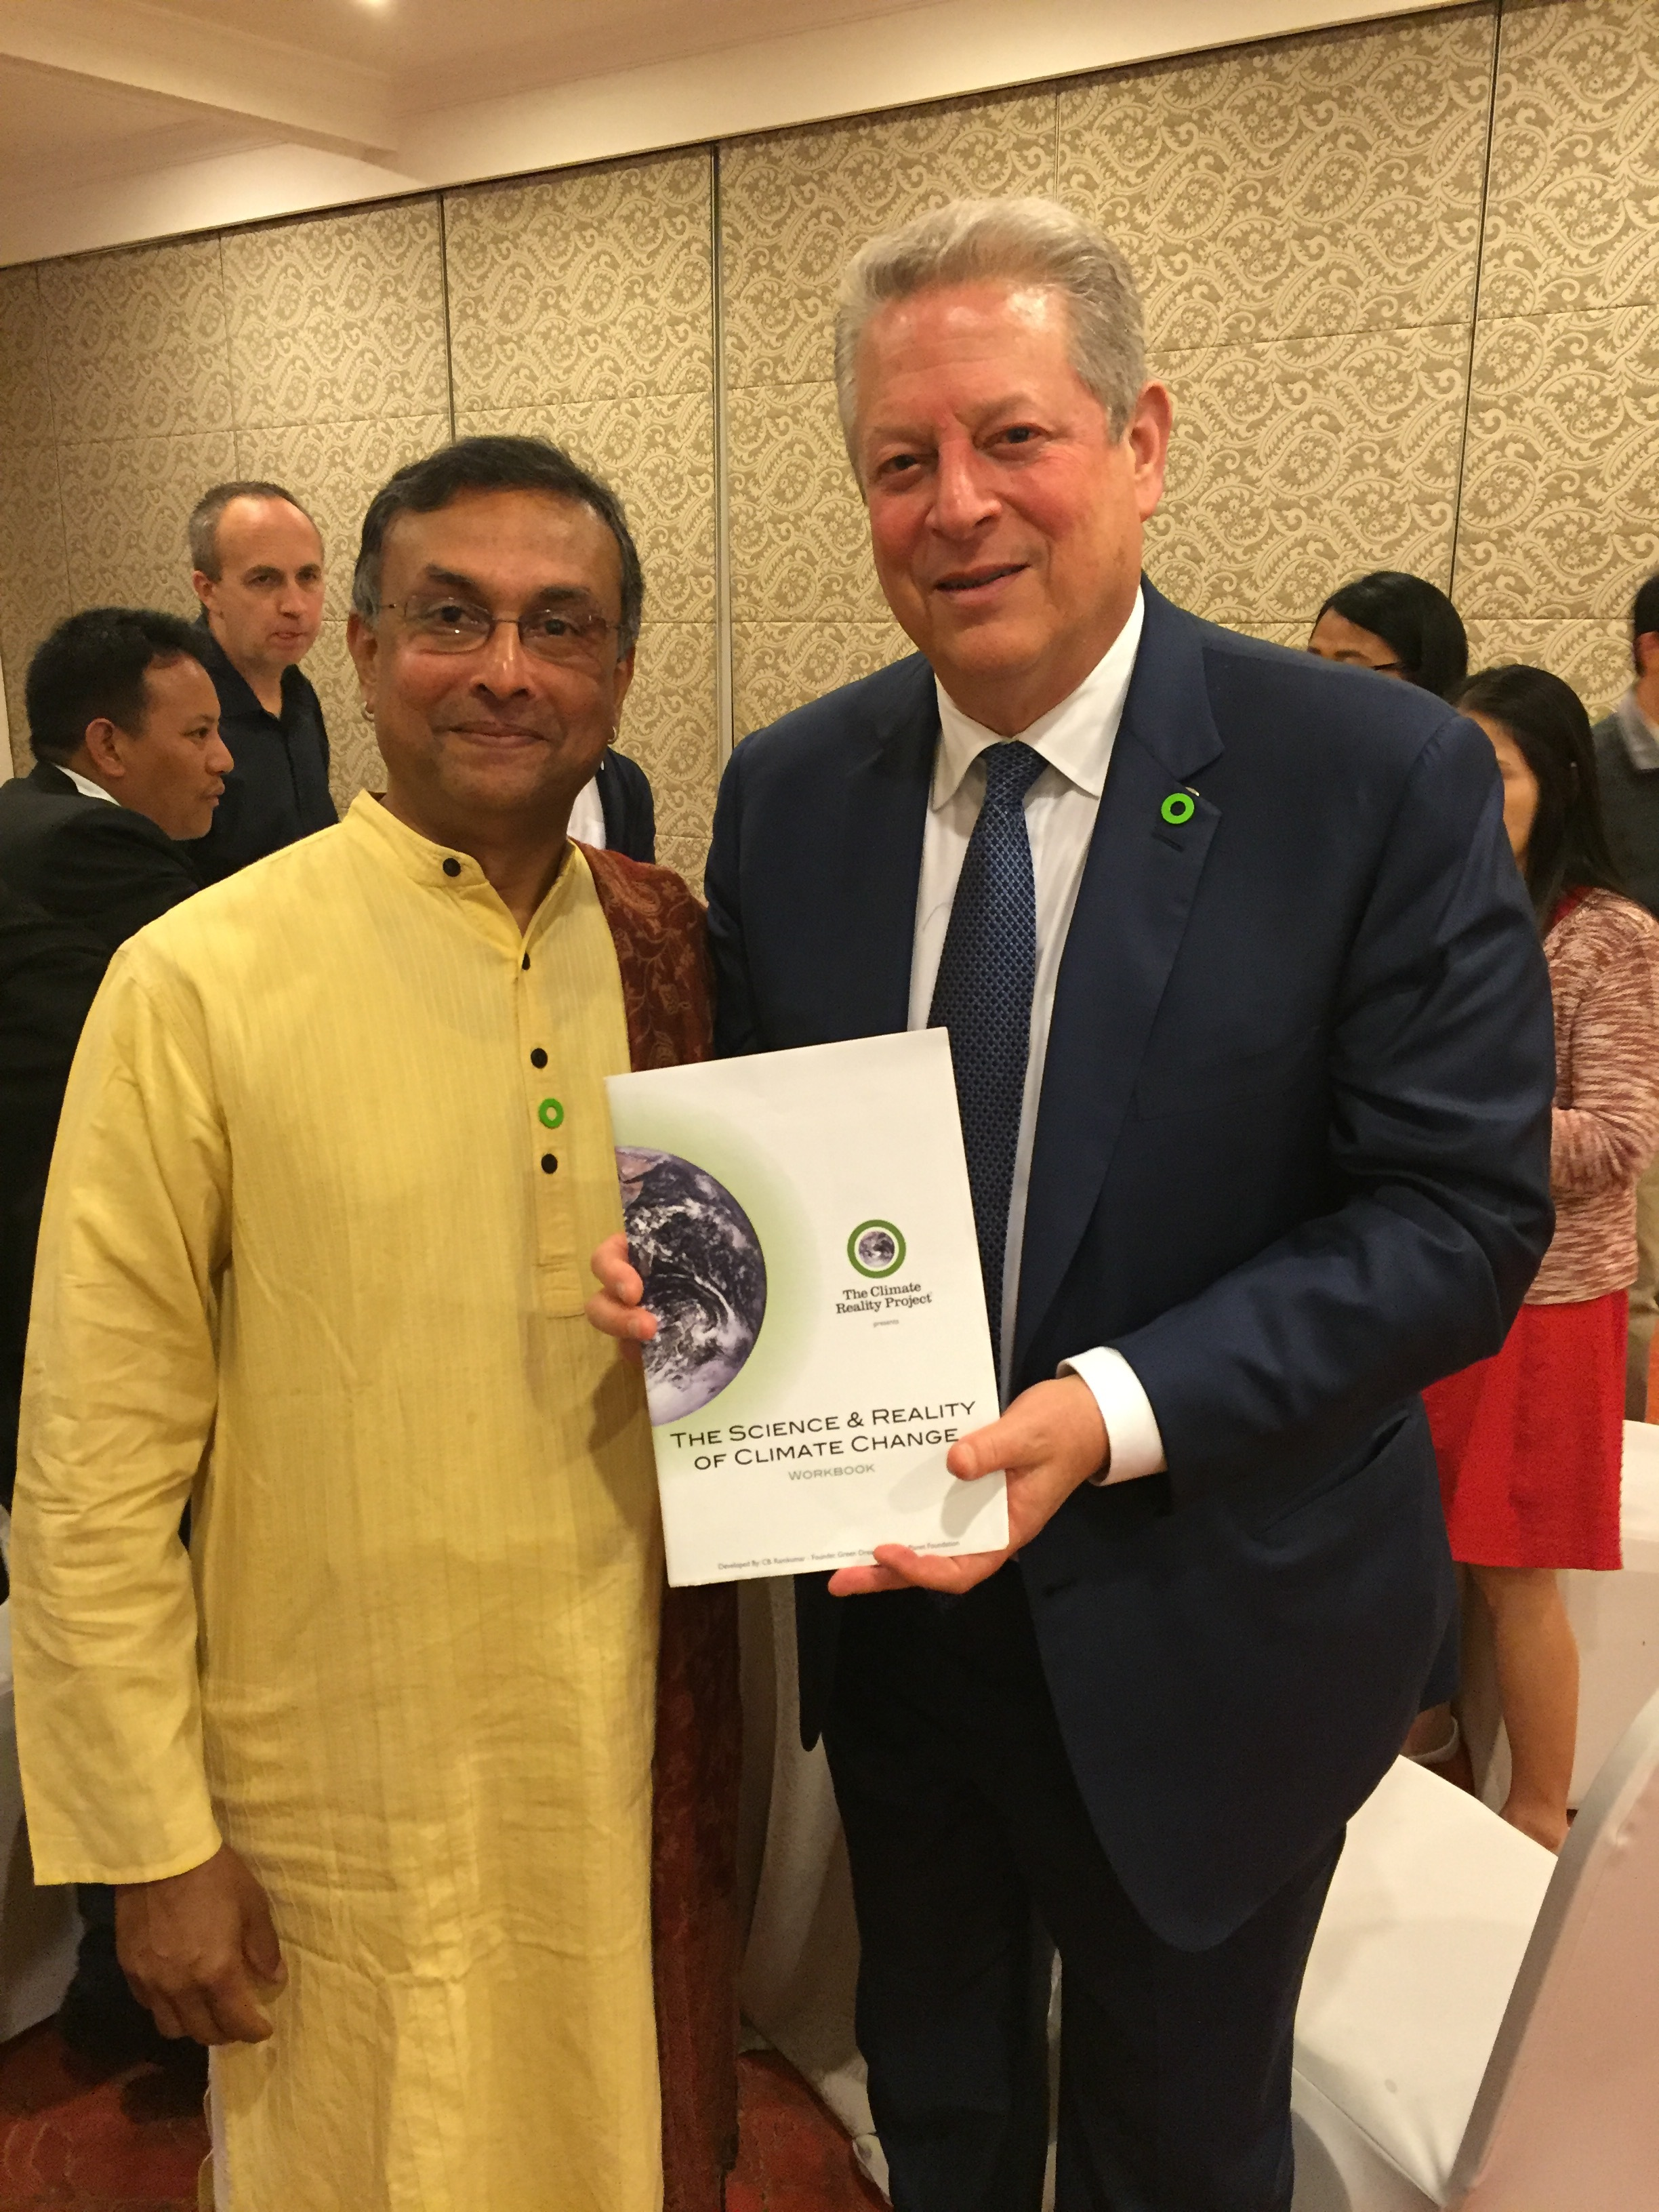 With Al Gore